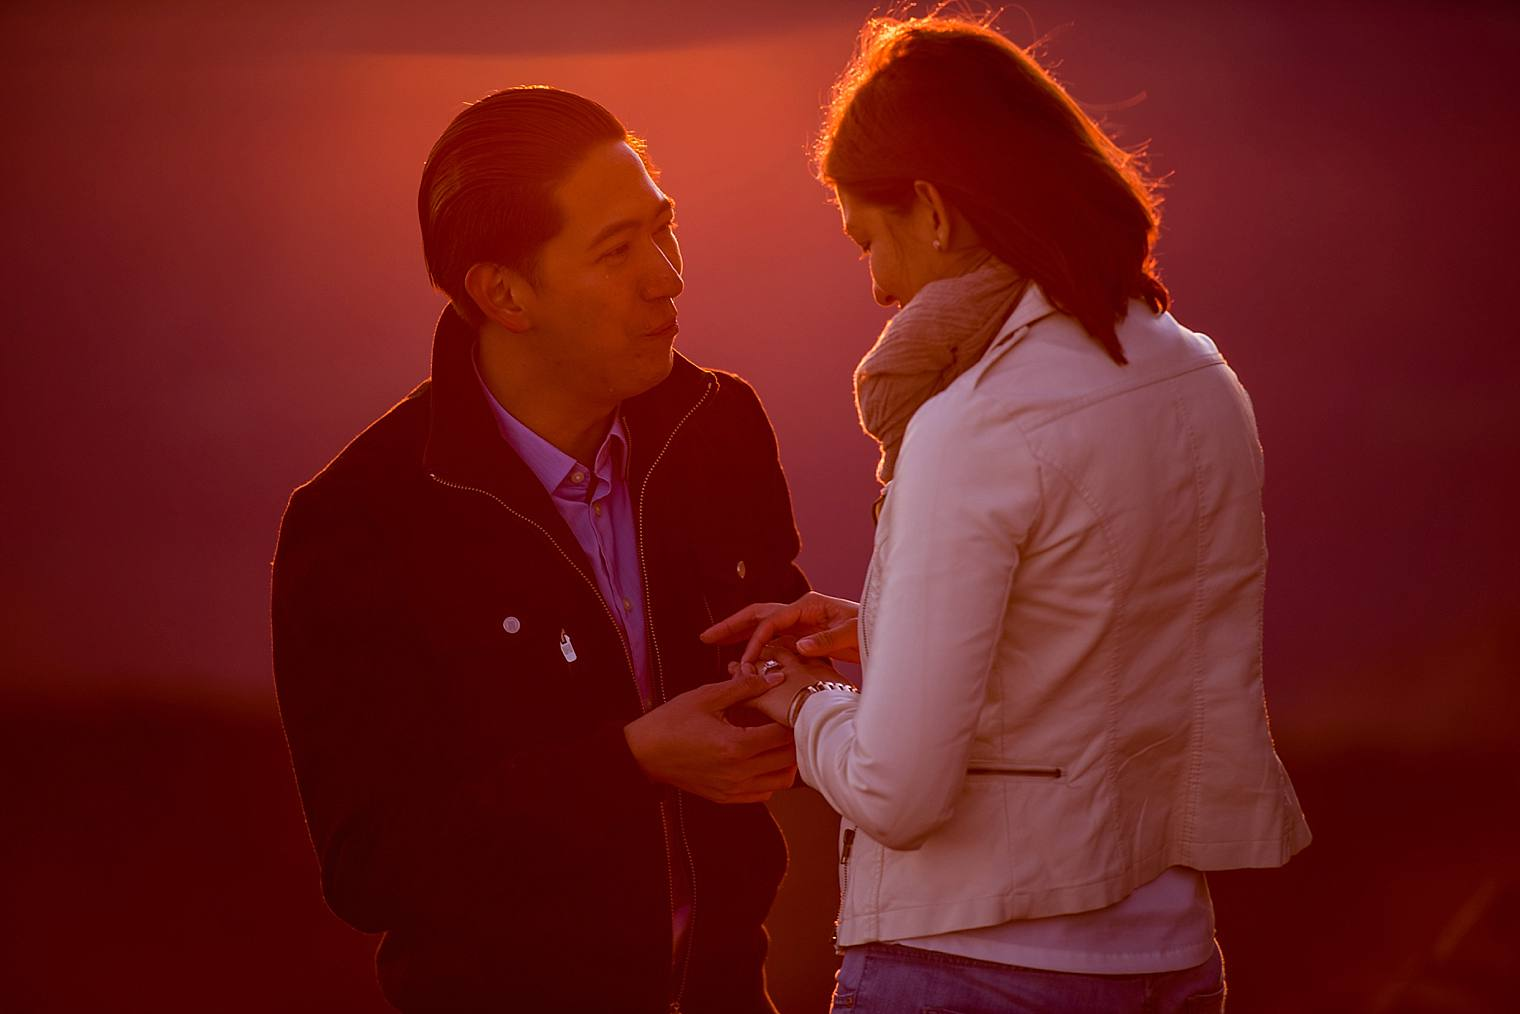 putting on engagement ring at sunrise